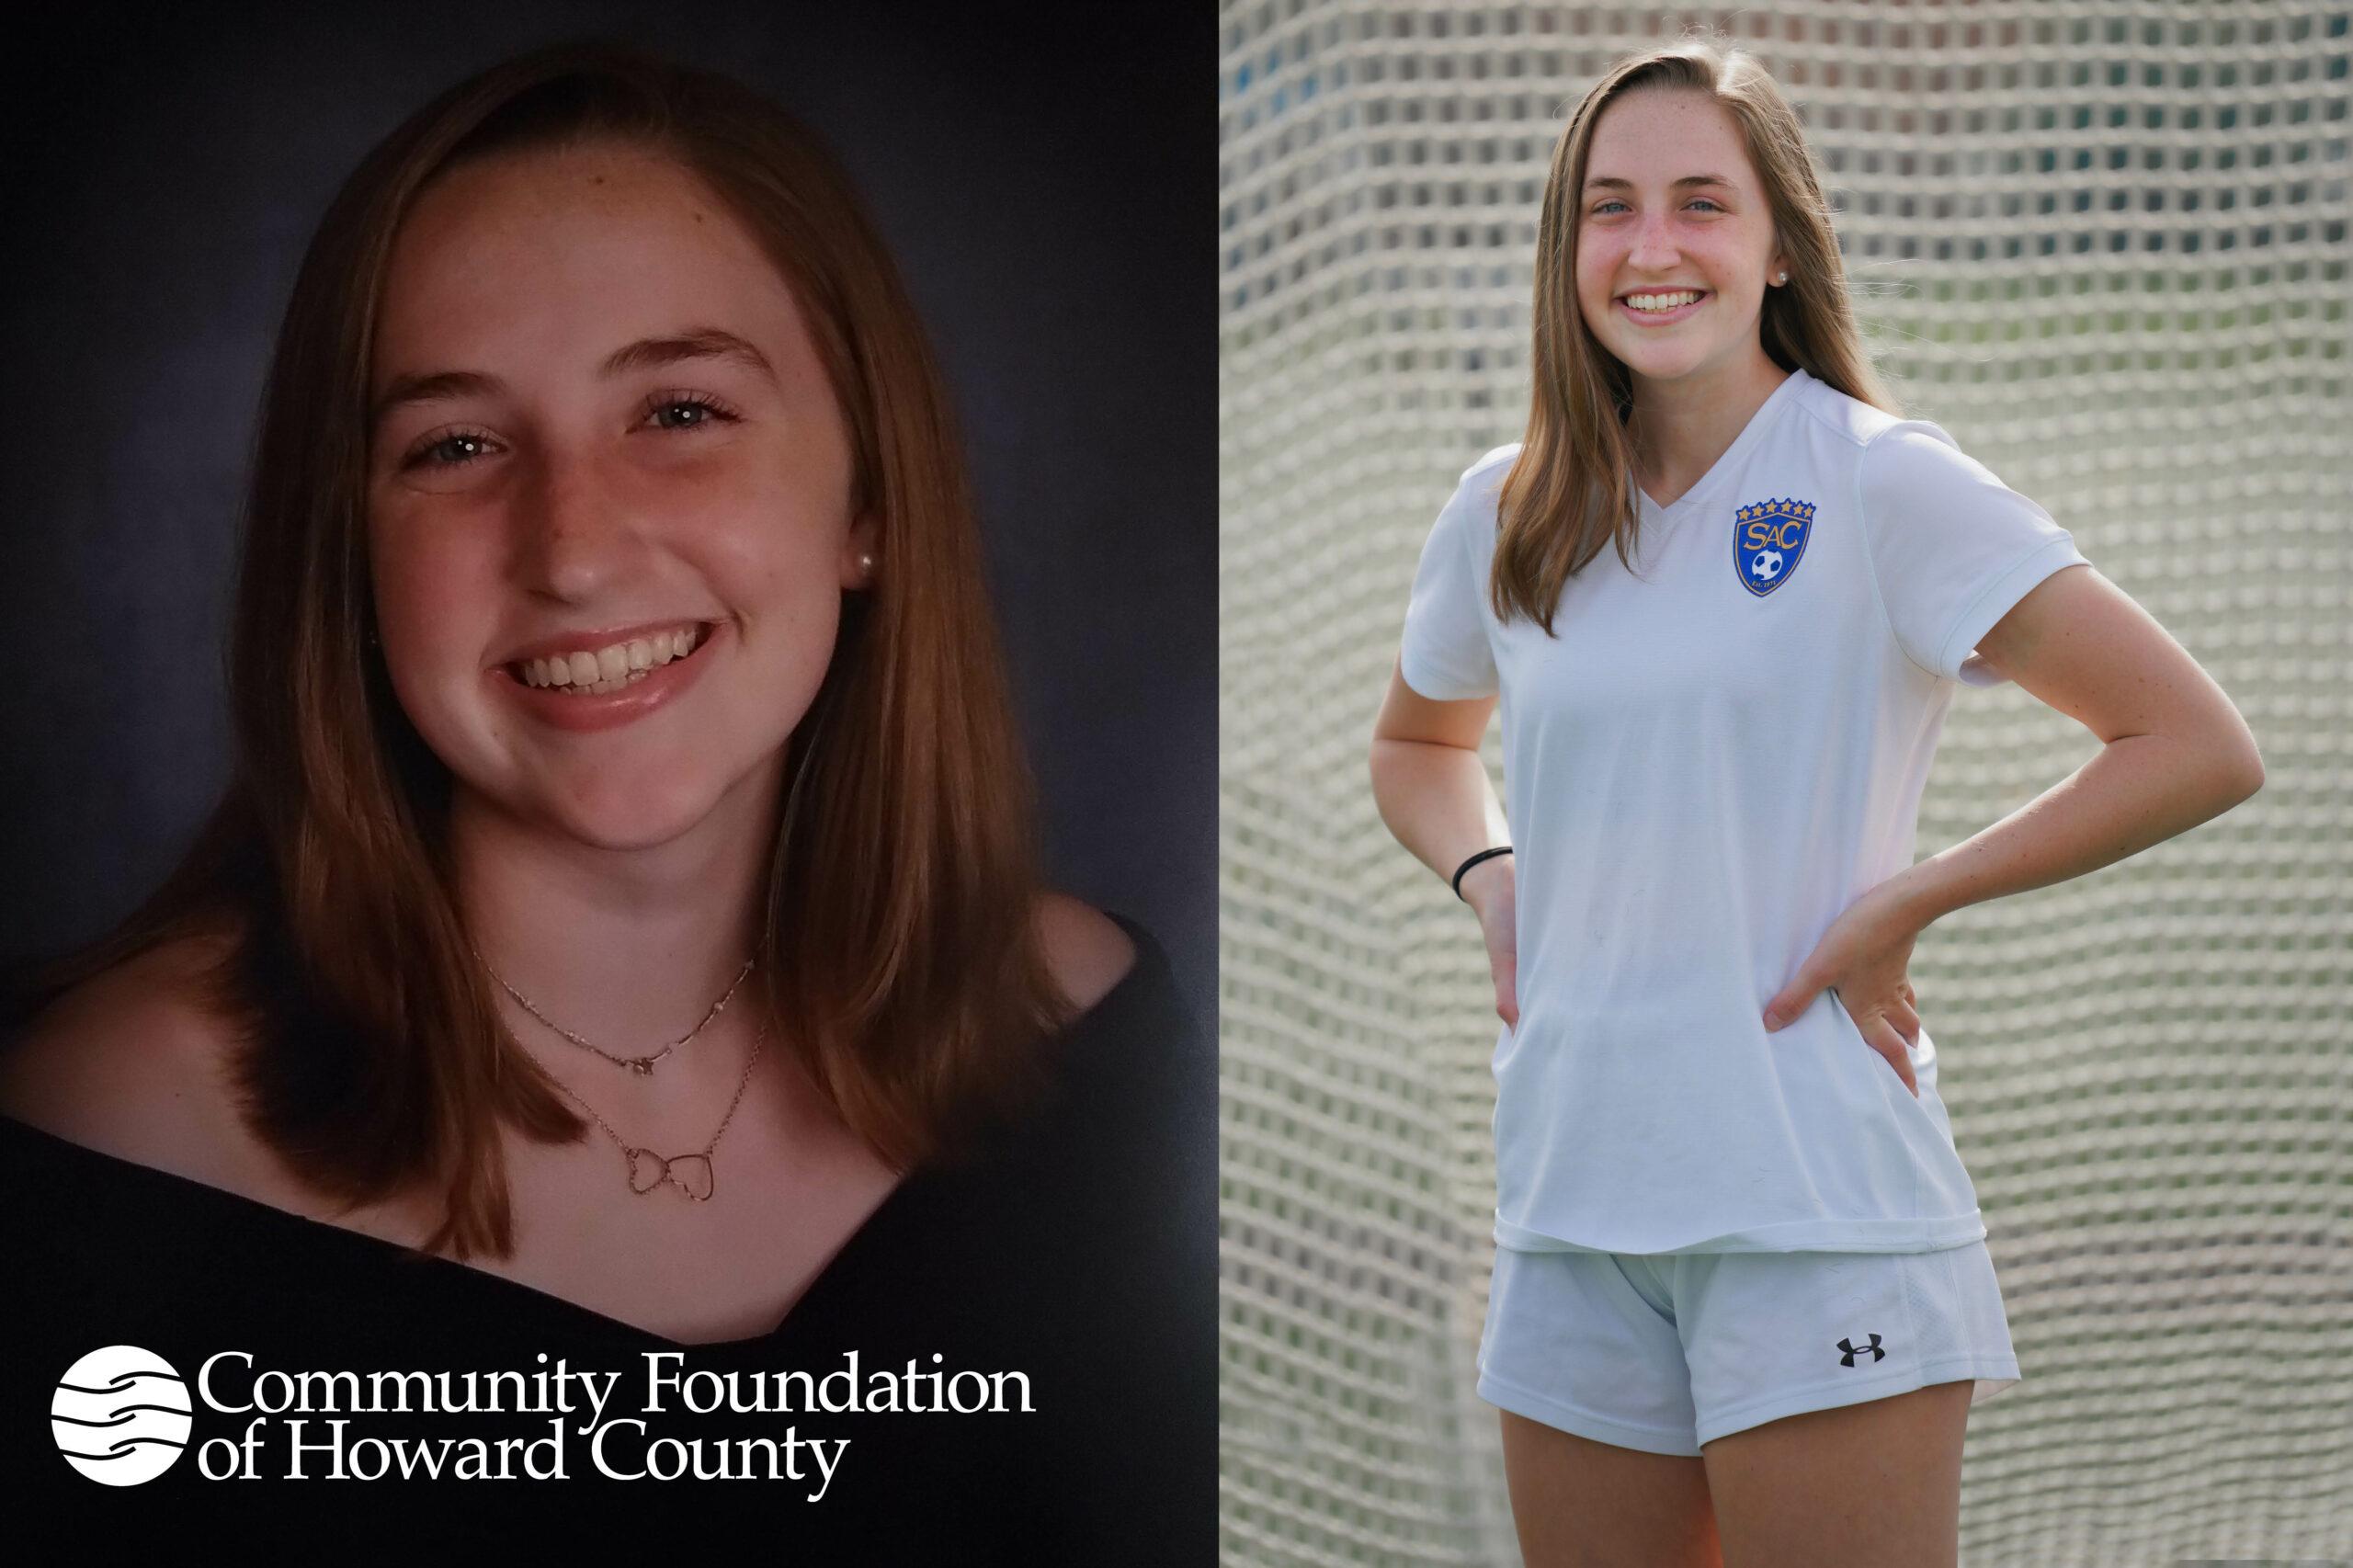 Community Foundation of Howard County awards 2021 annual scholarships